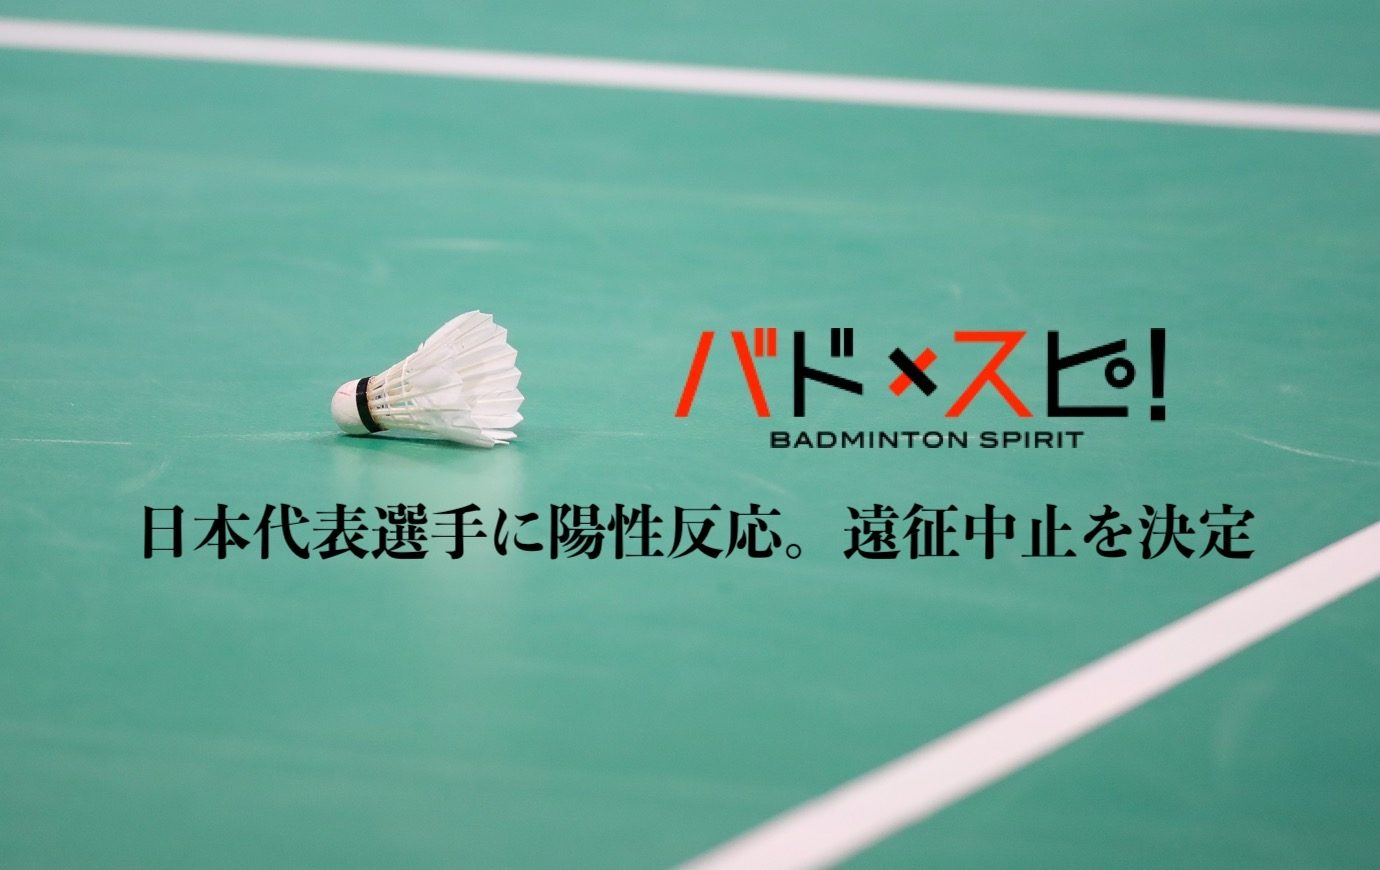 Photo of 【日本代表情報】日本代表選手に陽性反応。遠征の中止を決定 | バド×スピ!(バドミントンスピリット)